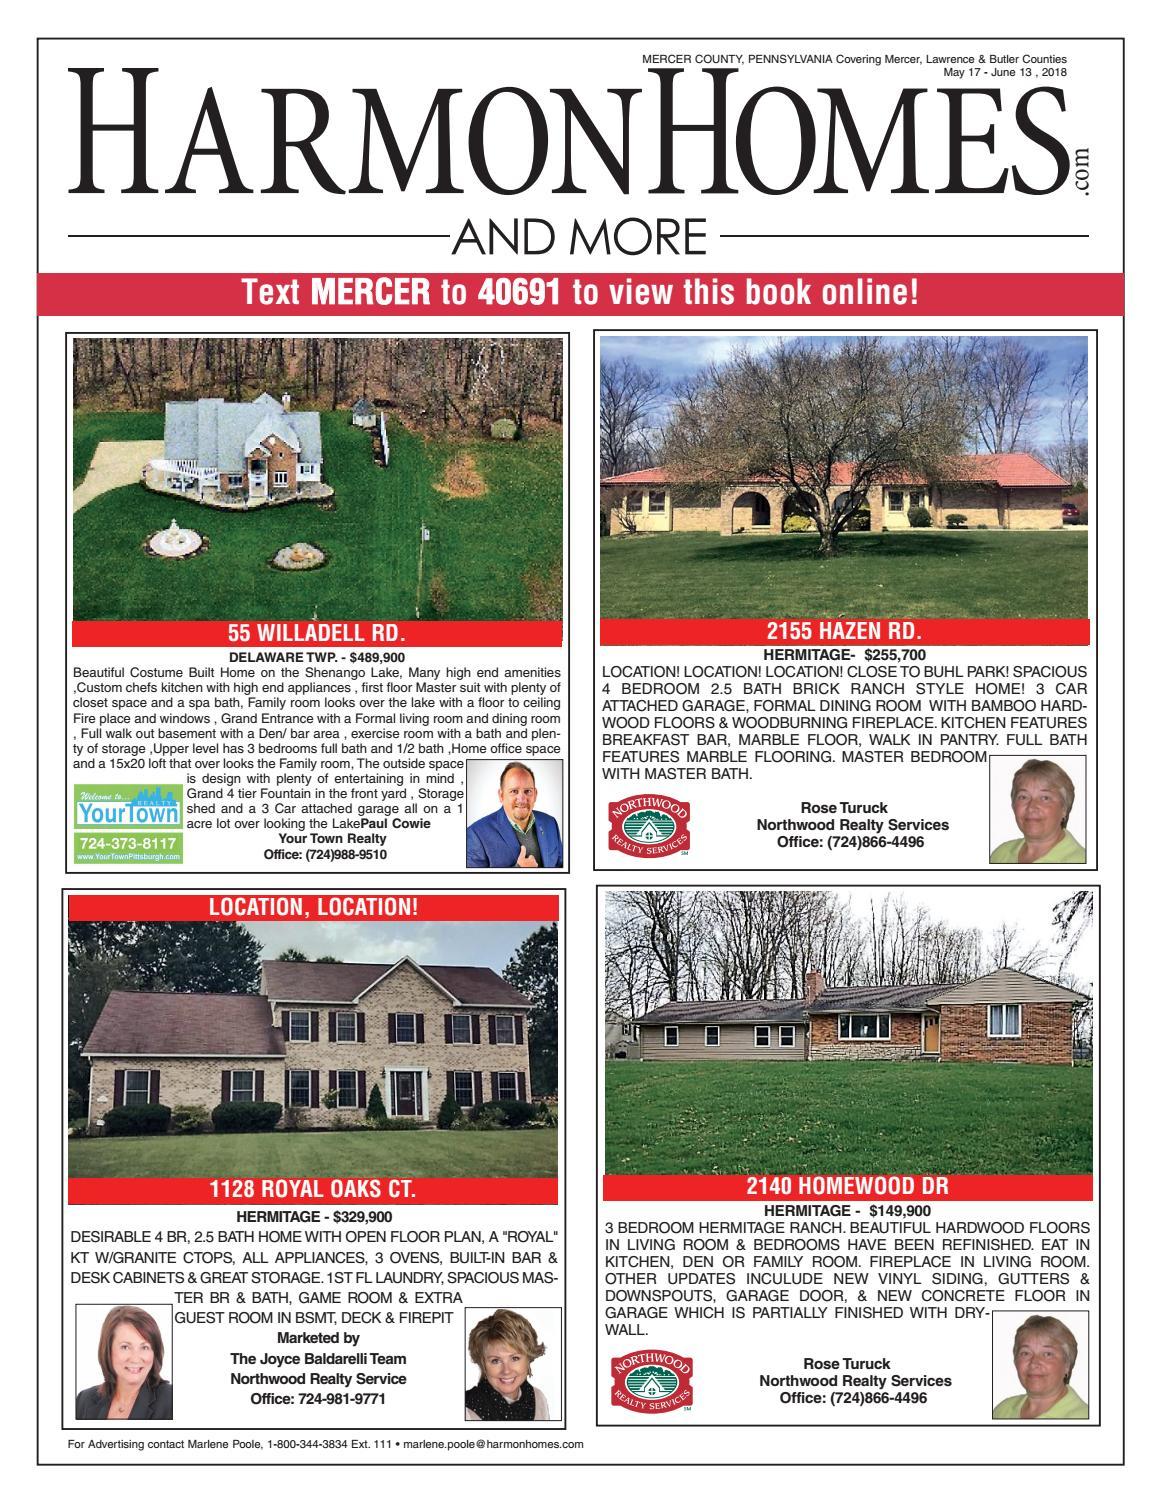 Harmon Homes: MERCER COUNTY by HarmonHomes com - issuu